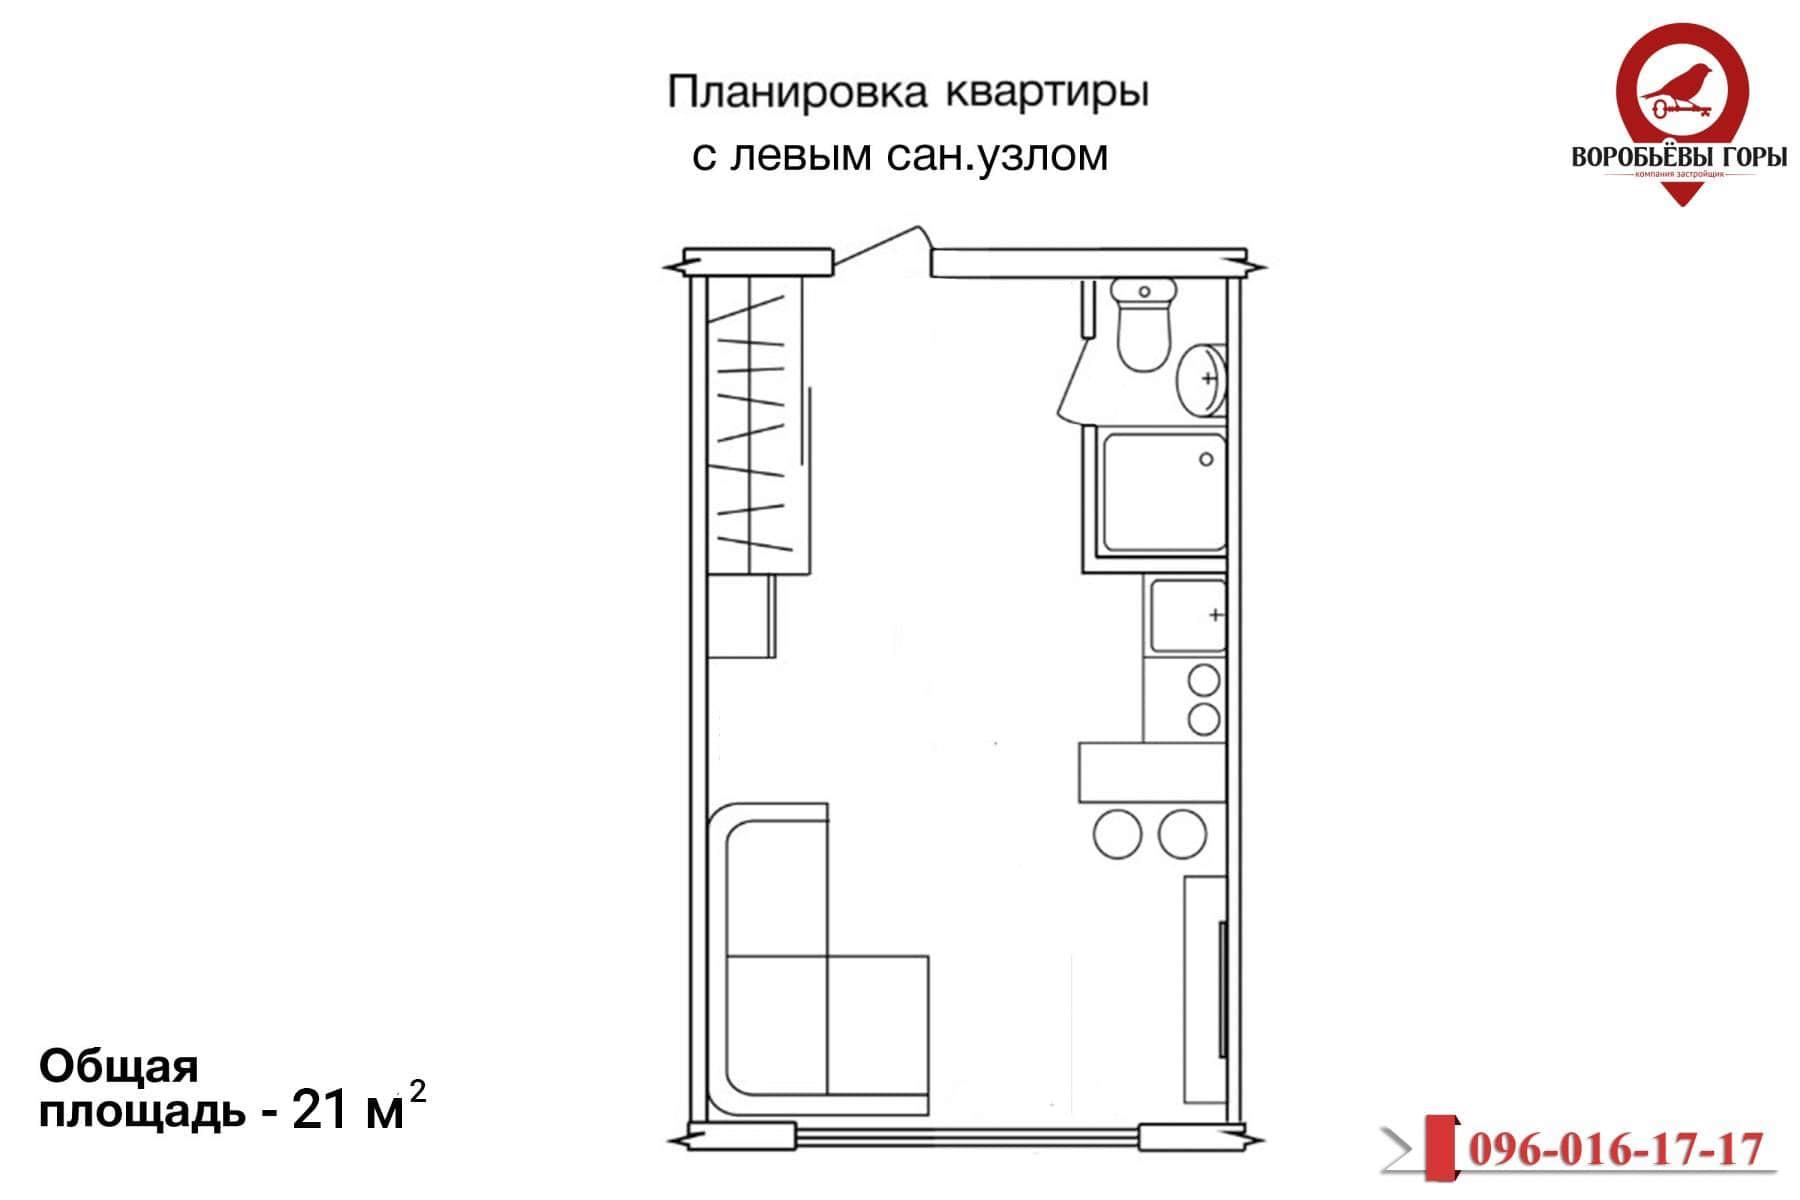 квартира 21м2 Воробьевы горы